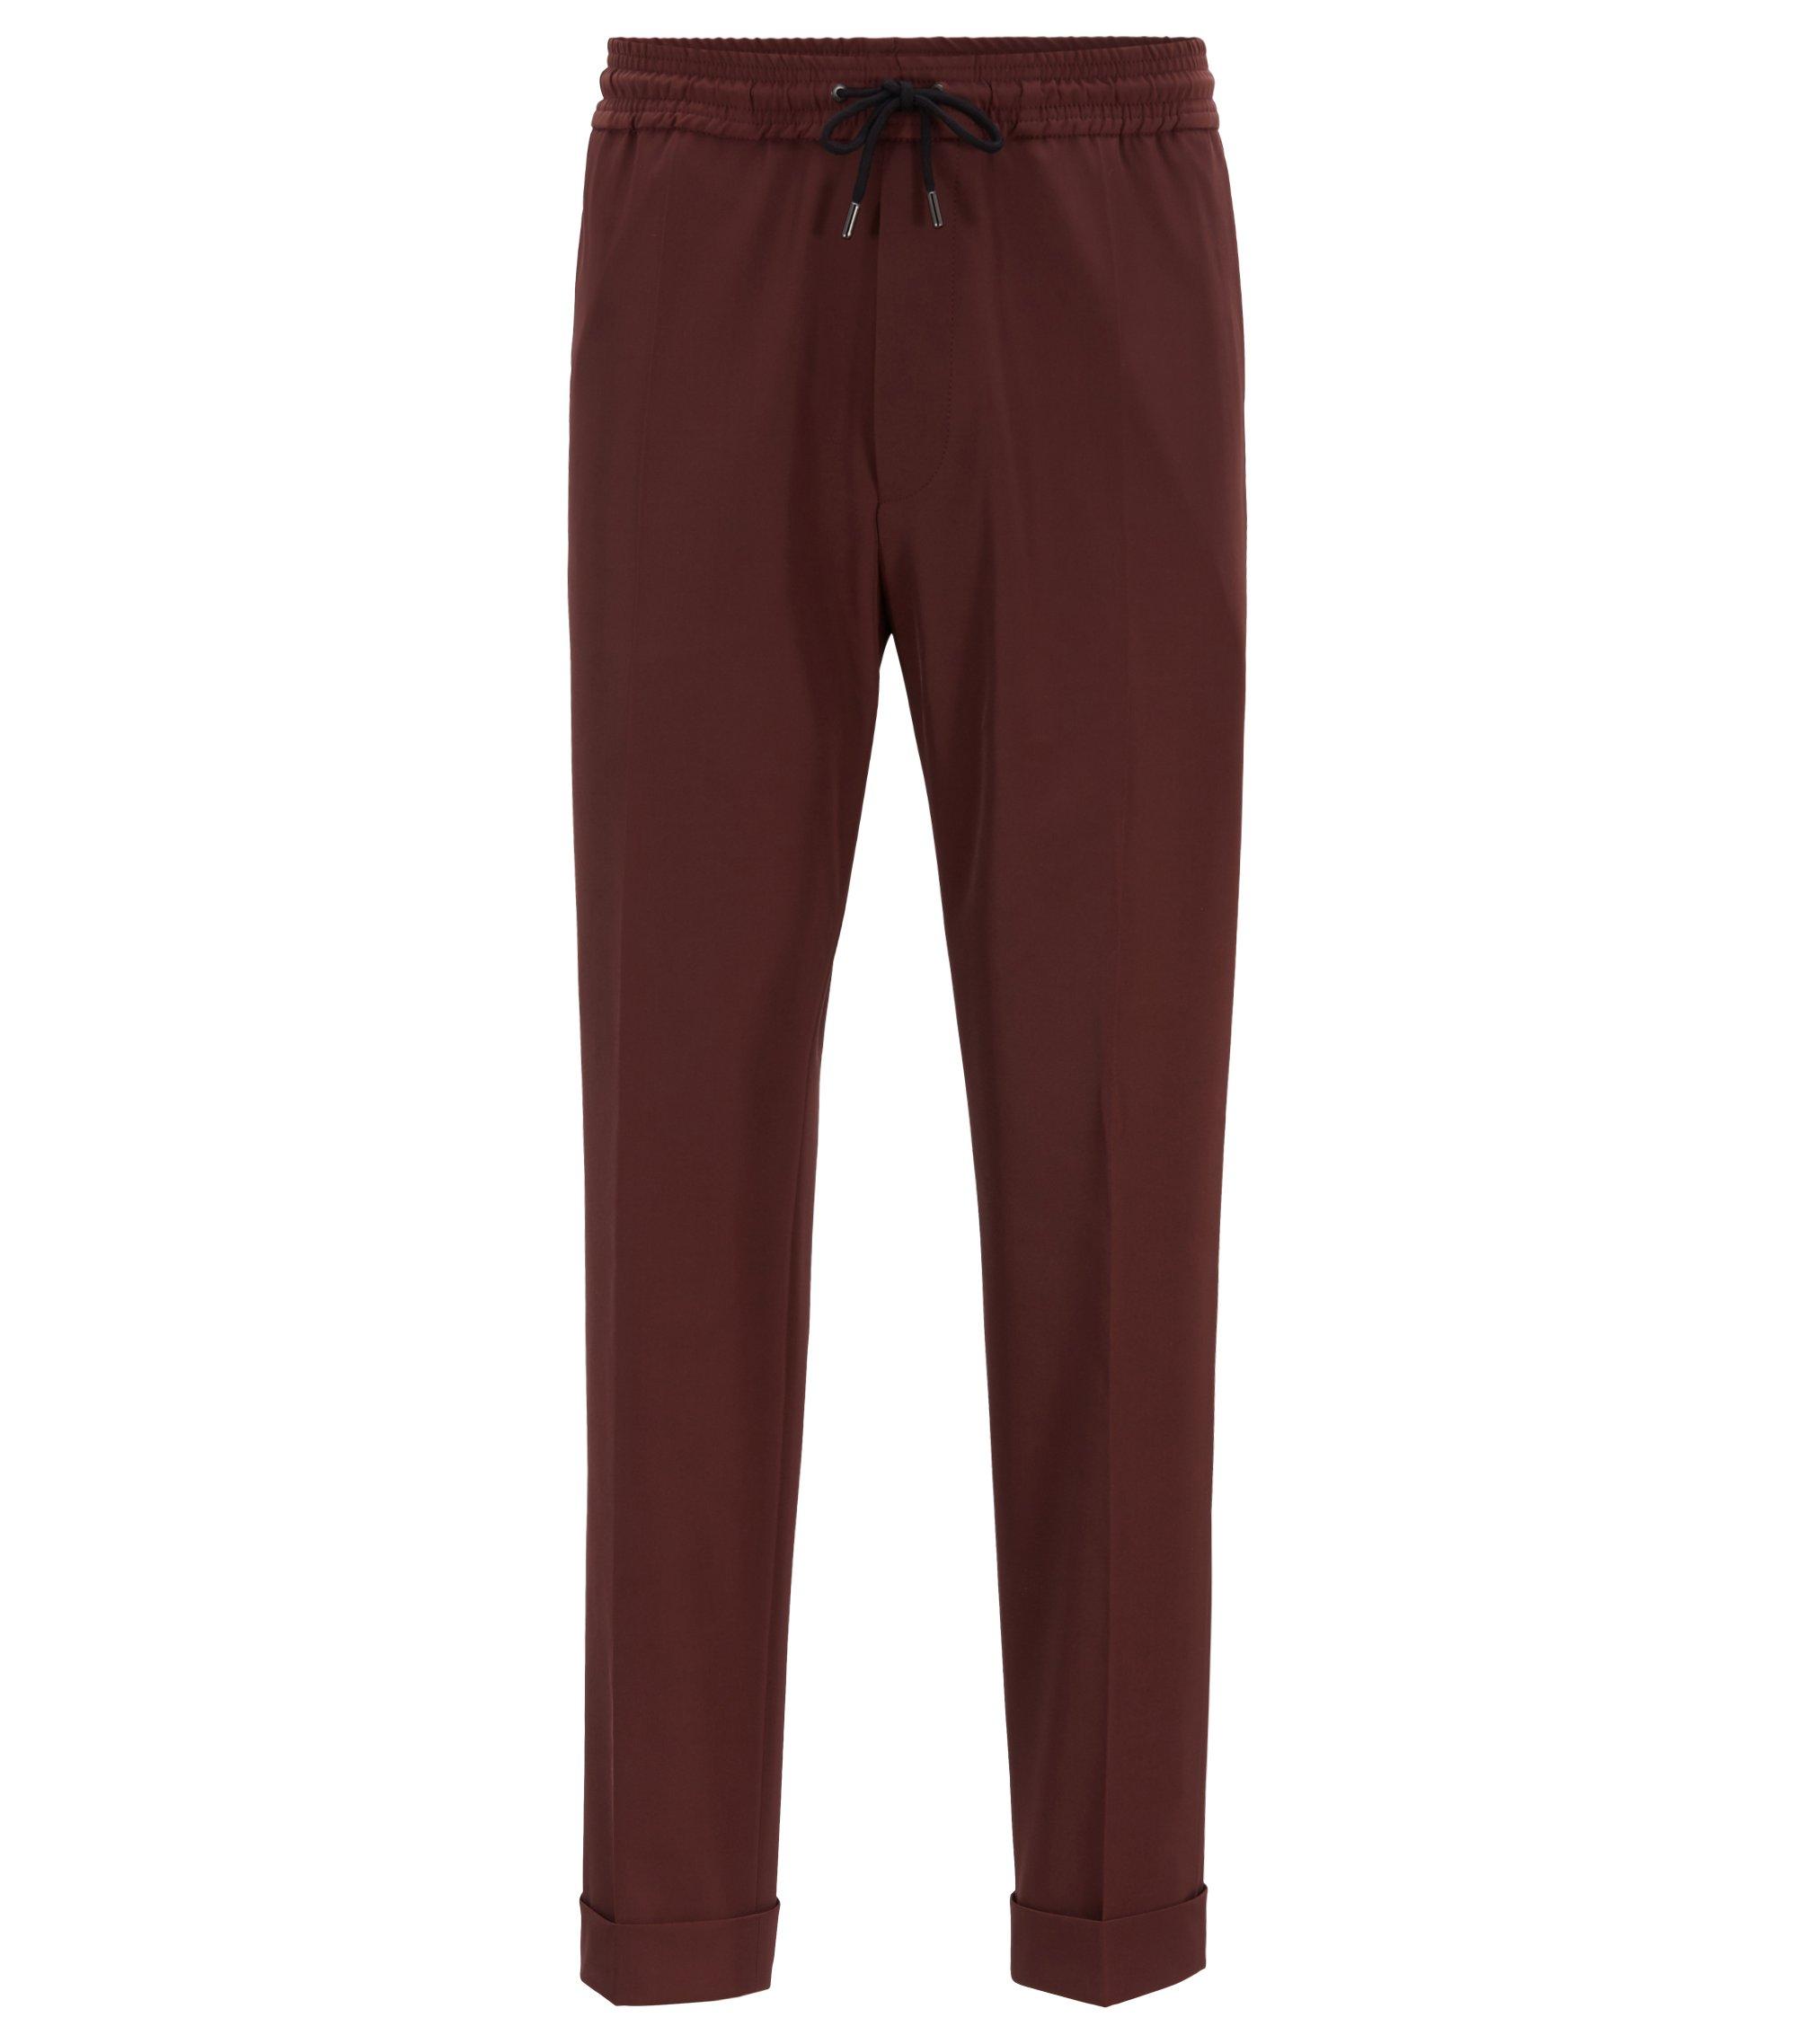 Pantalones relaxed fit de estilo tobillero con cintura con cordón, Rojo oscuro